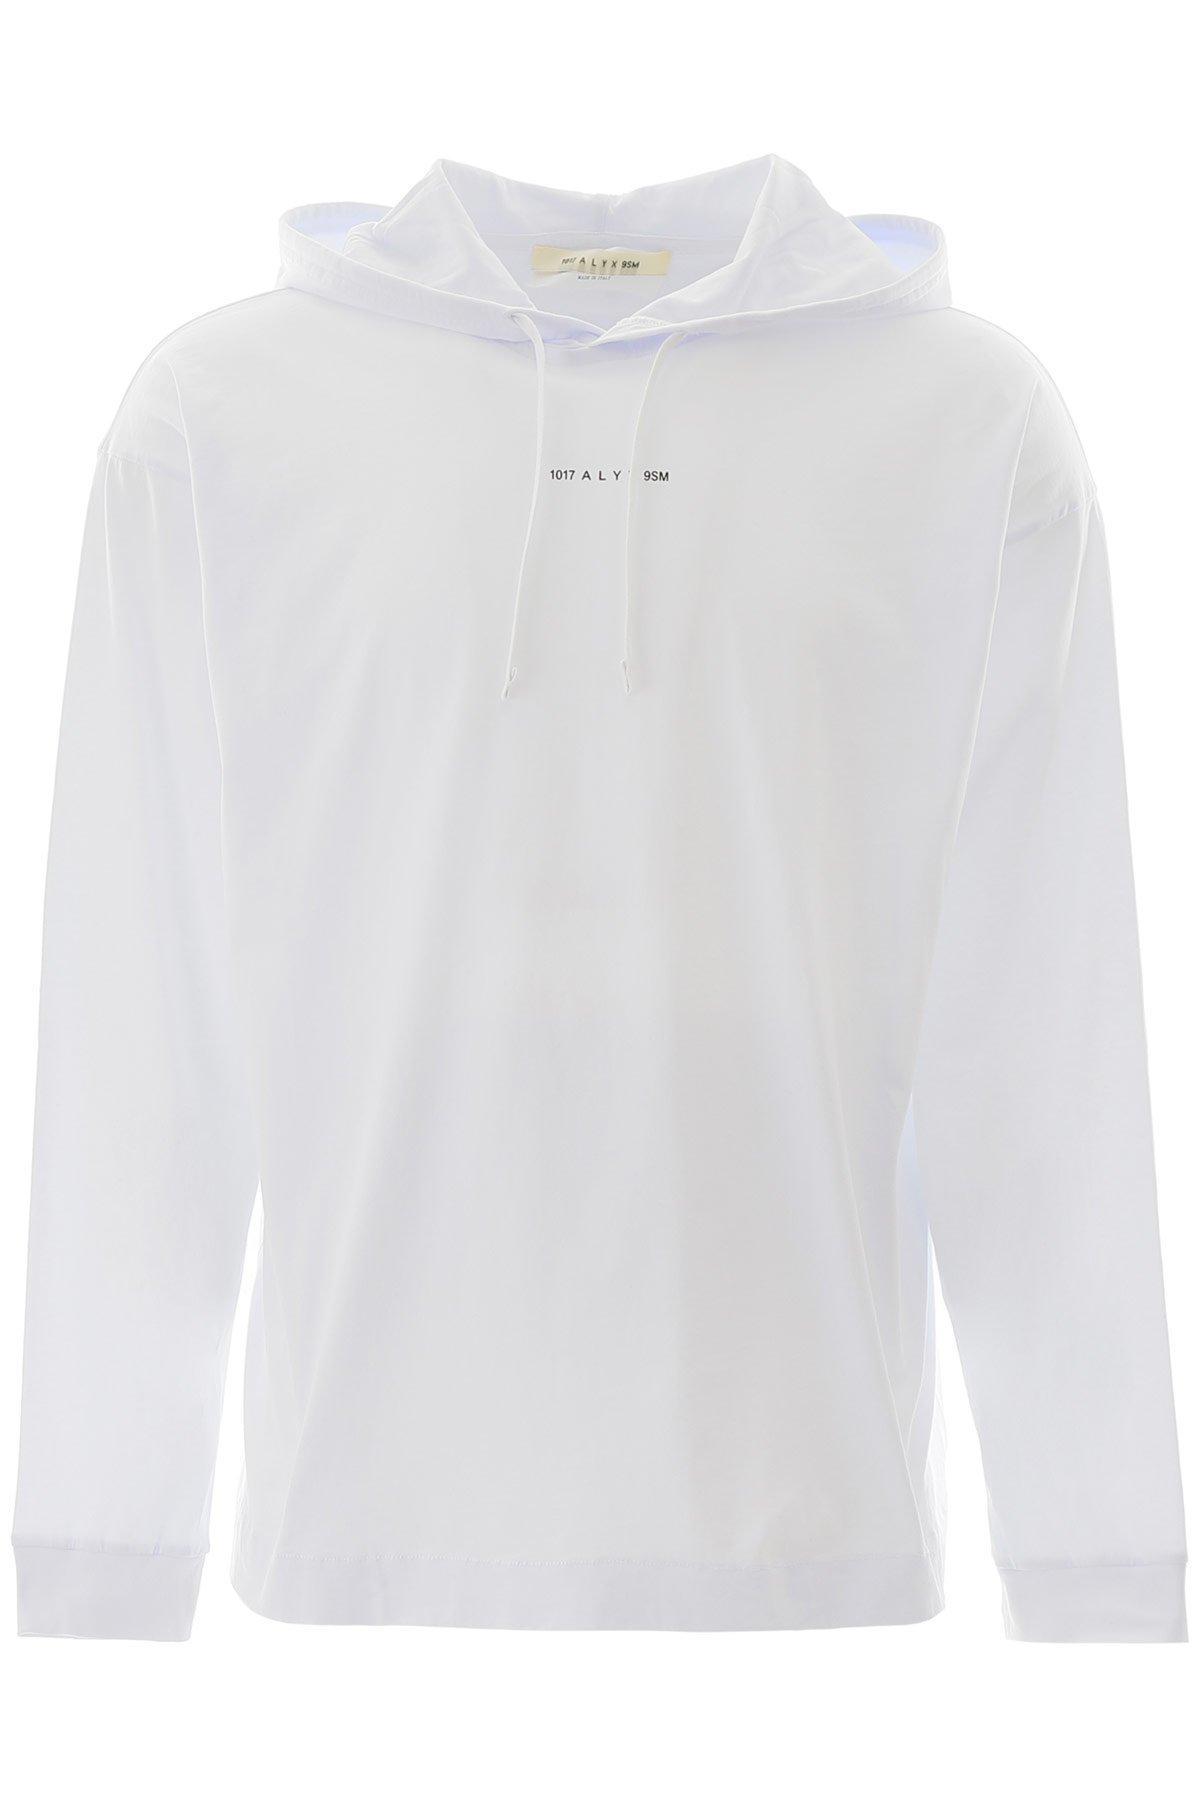 1017 alyx 9sm asphere hooded t-shirt